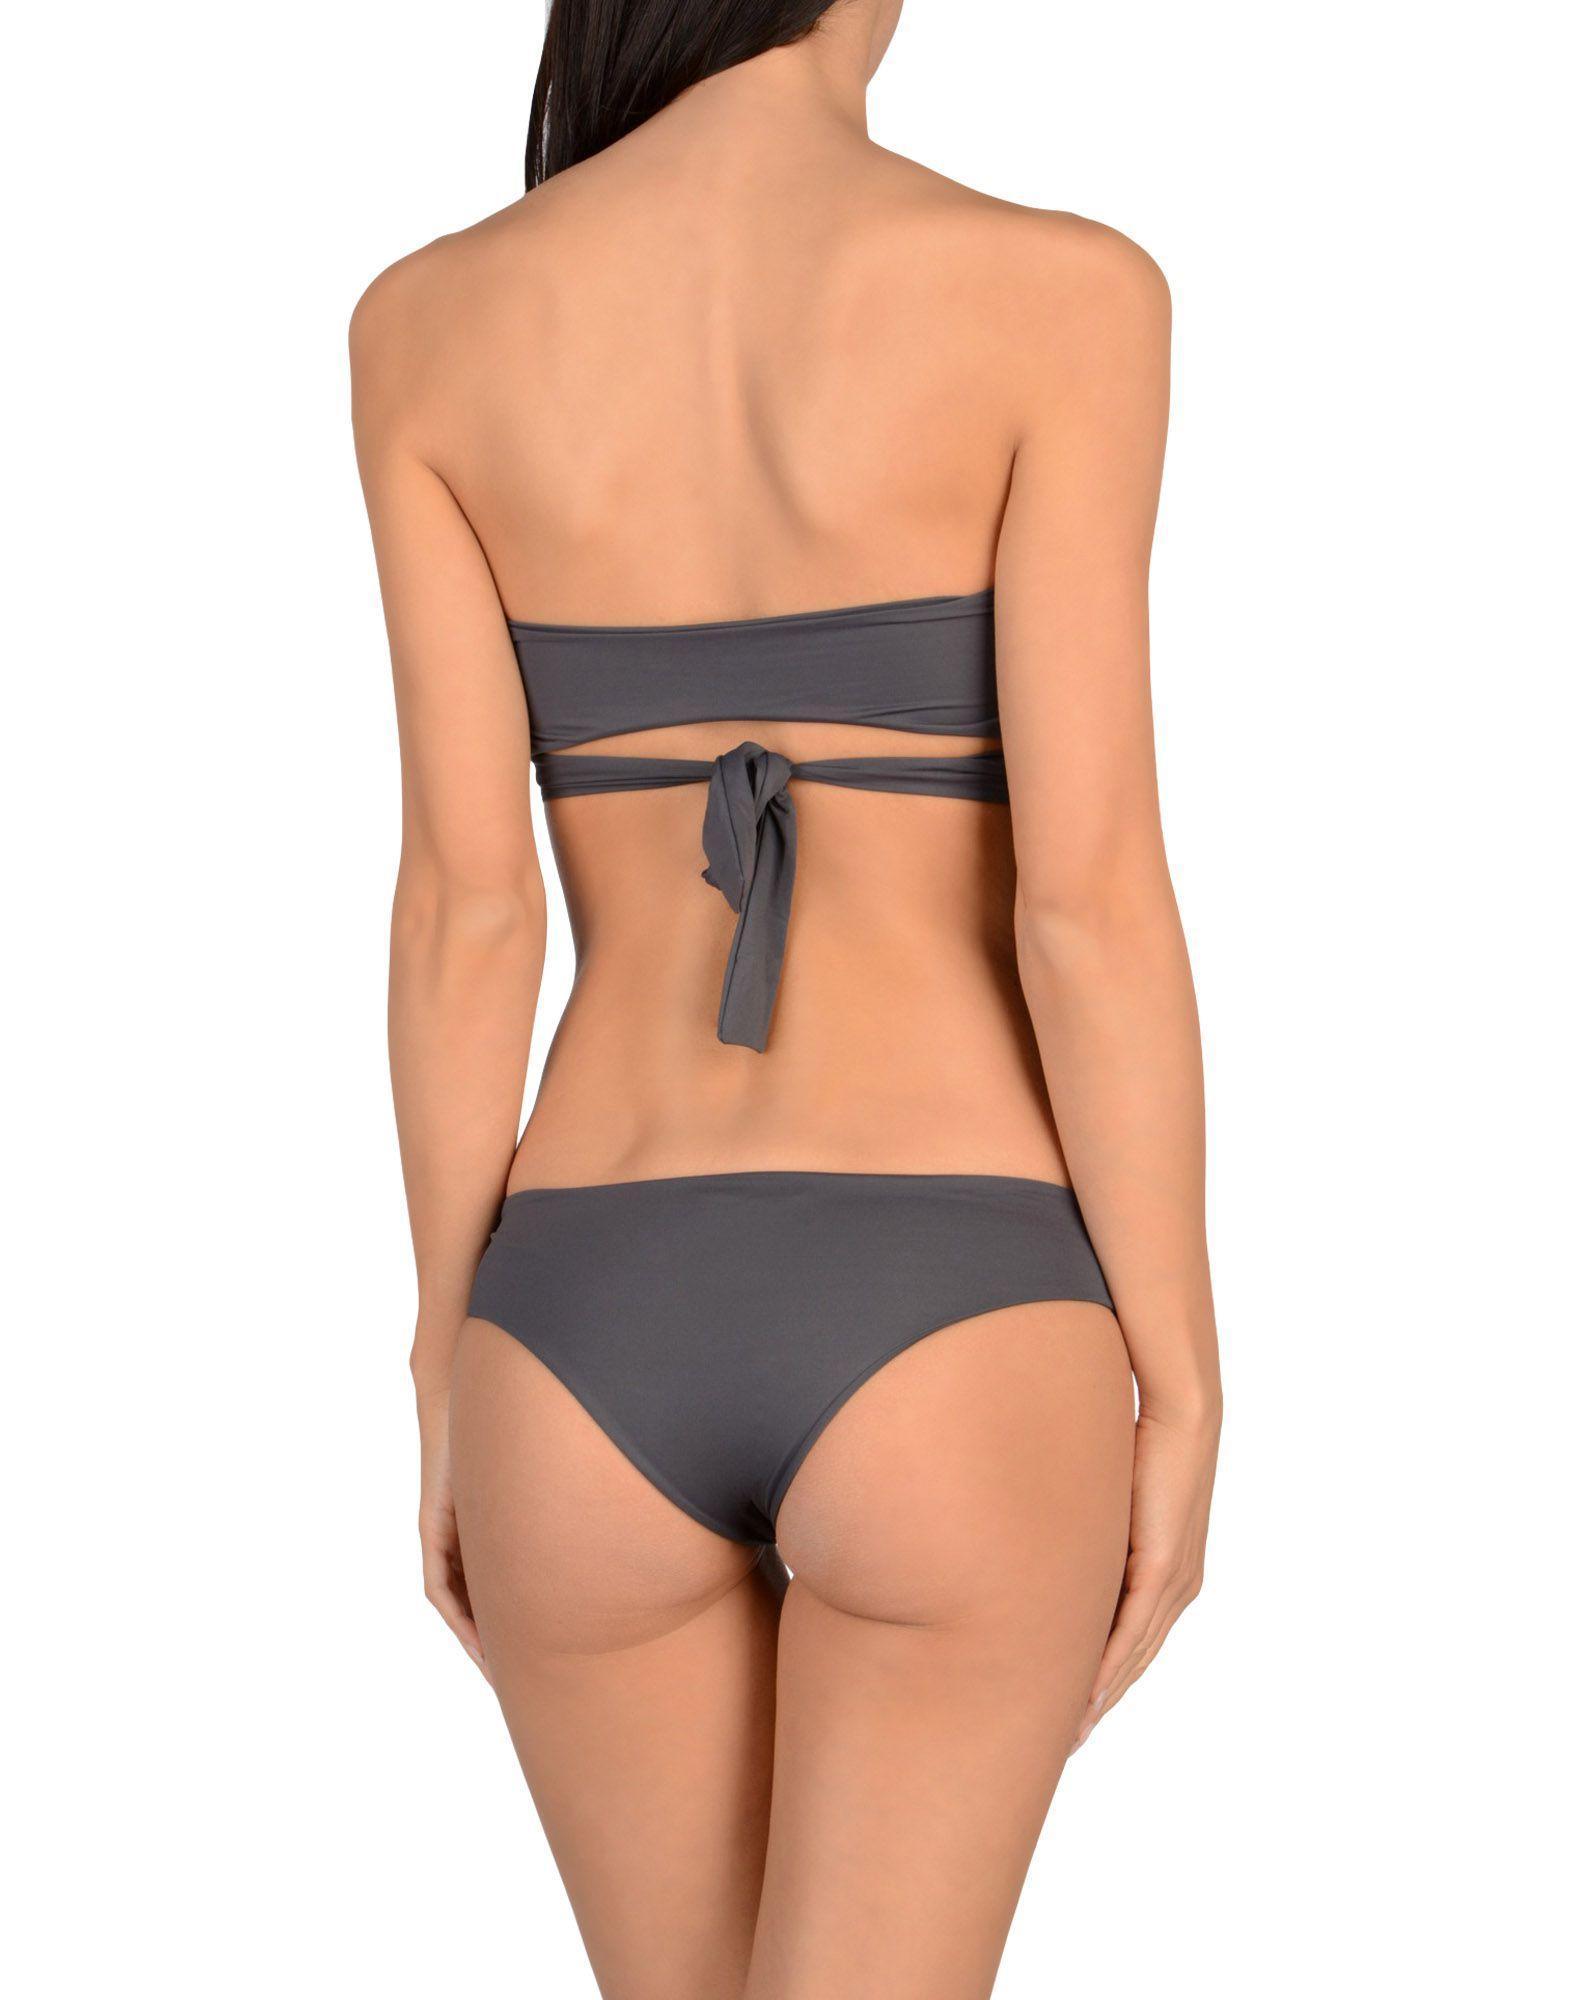 S And S Lead Bandeau Bikini Set